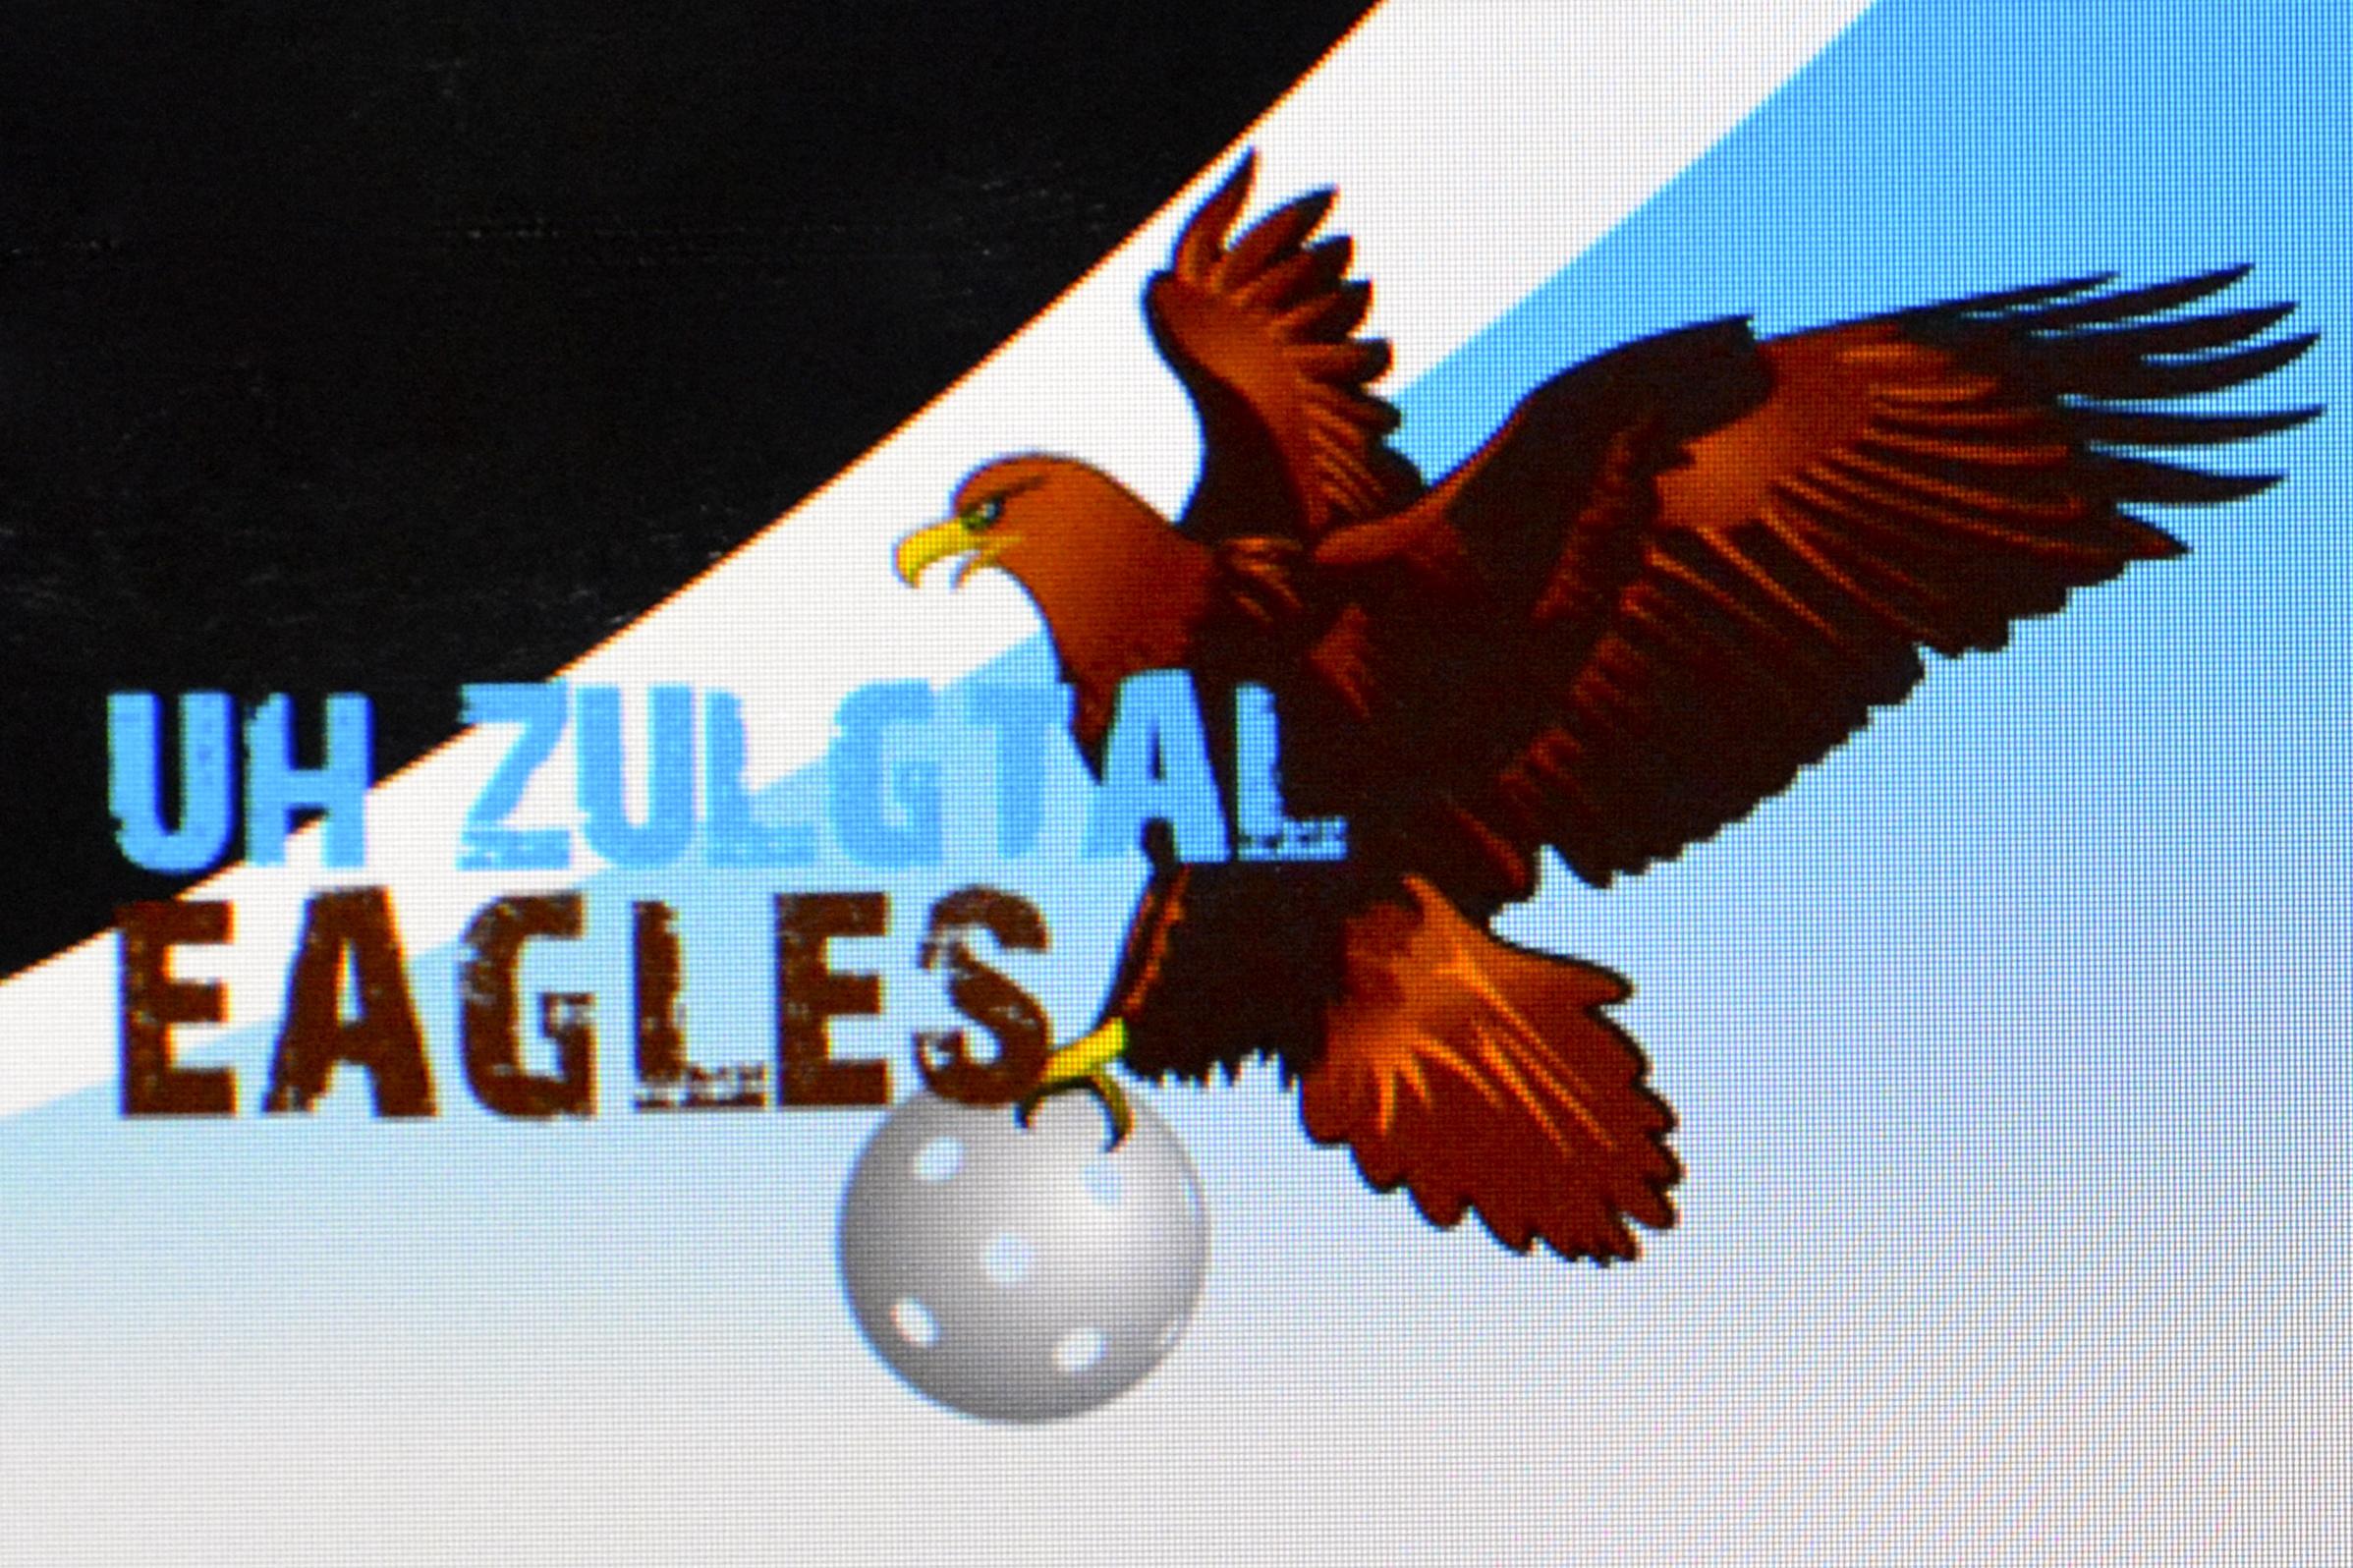 Herren Aktive GF 3.Liga UH Zulgtal Eagles Saison 2014/15